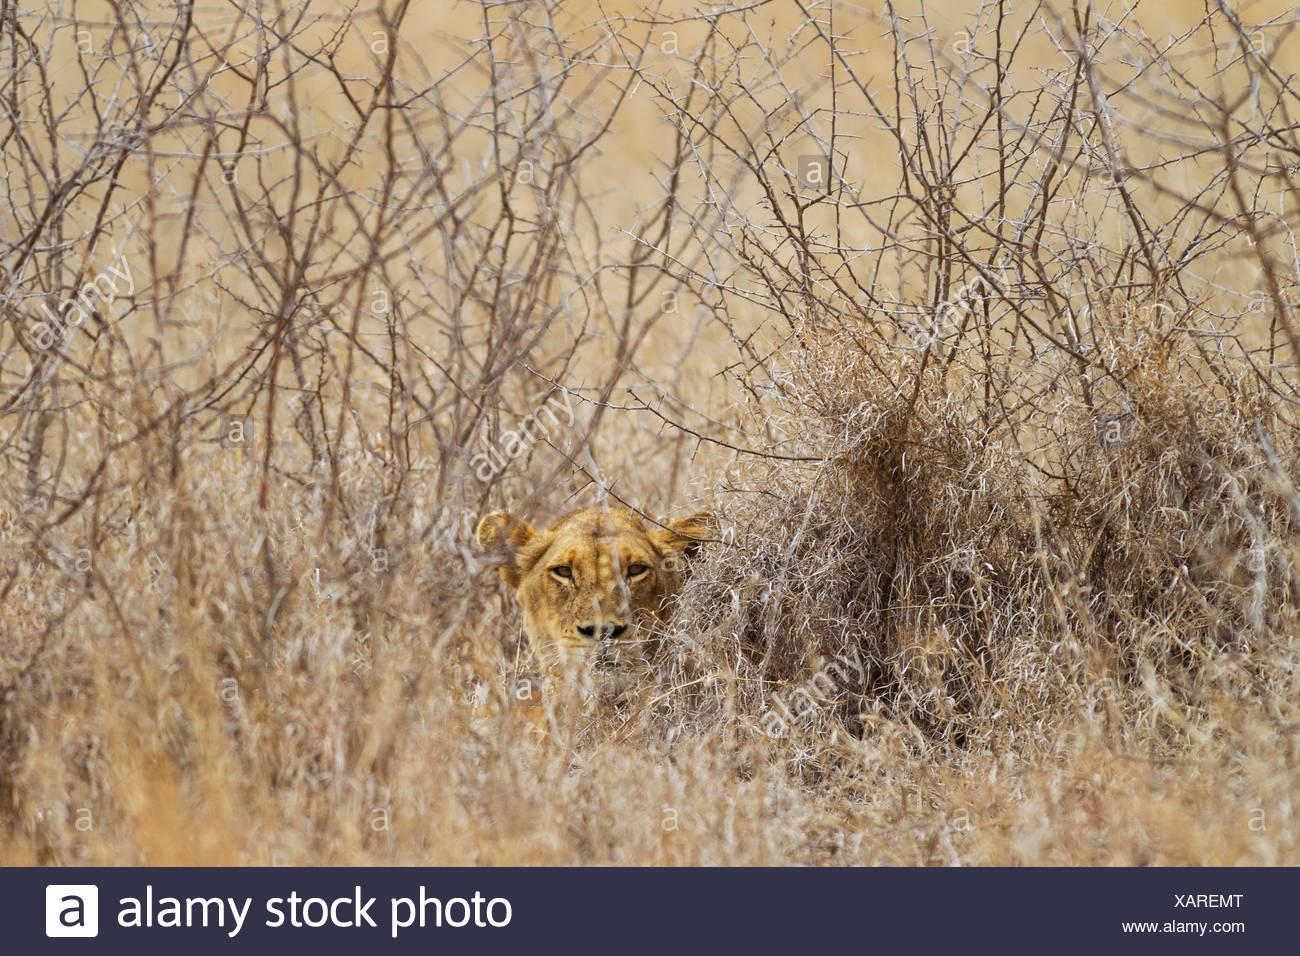 Löwin (Panthera Leo), verborgen, beobachtet ihre Umgebung, Krüger Nationalpark, Südafrika Stockbild